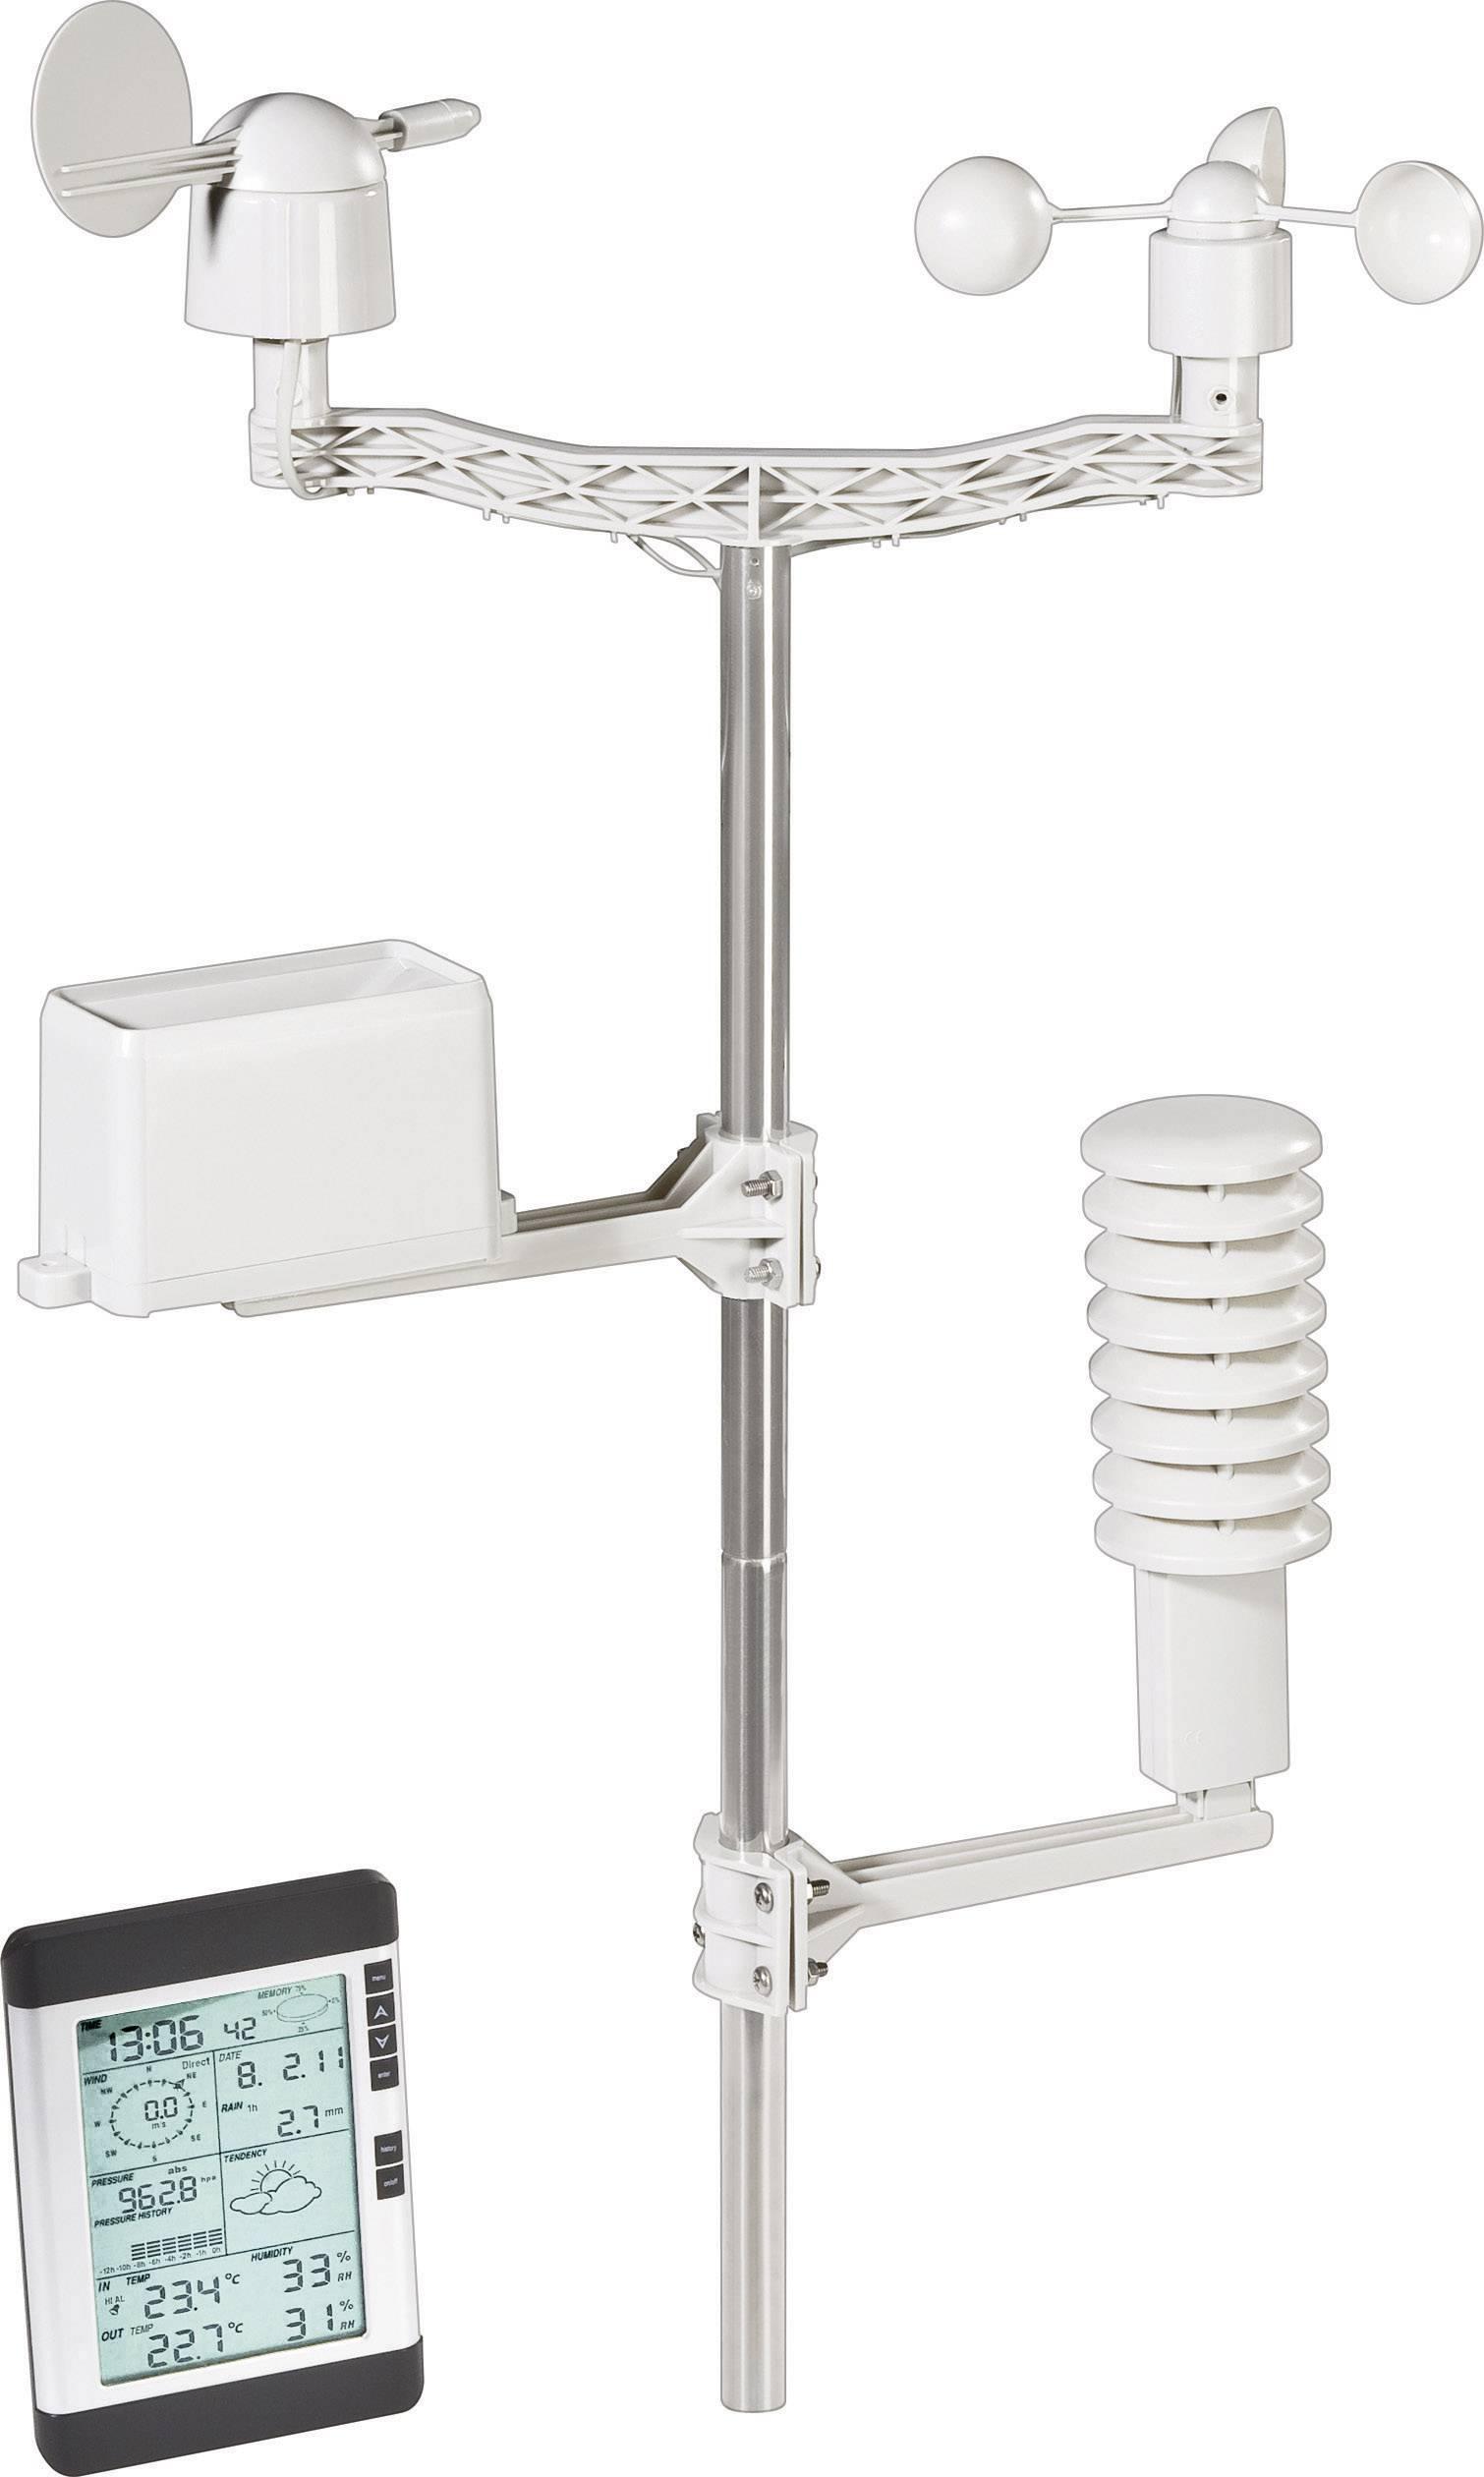 Digitálna bezdrôtová meteostanica Professional USB WS-0101, Max. dosah 100 m